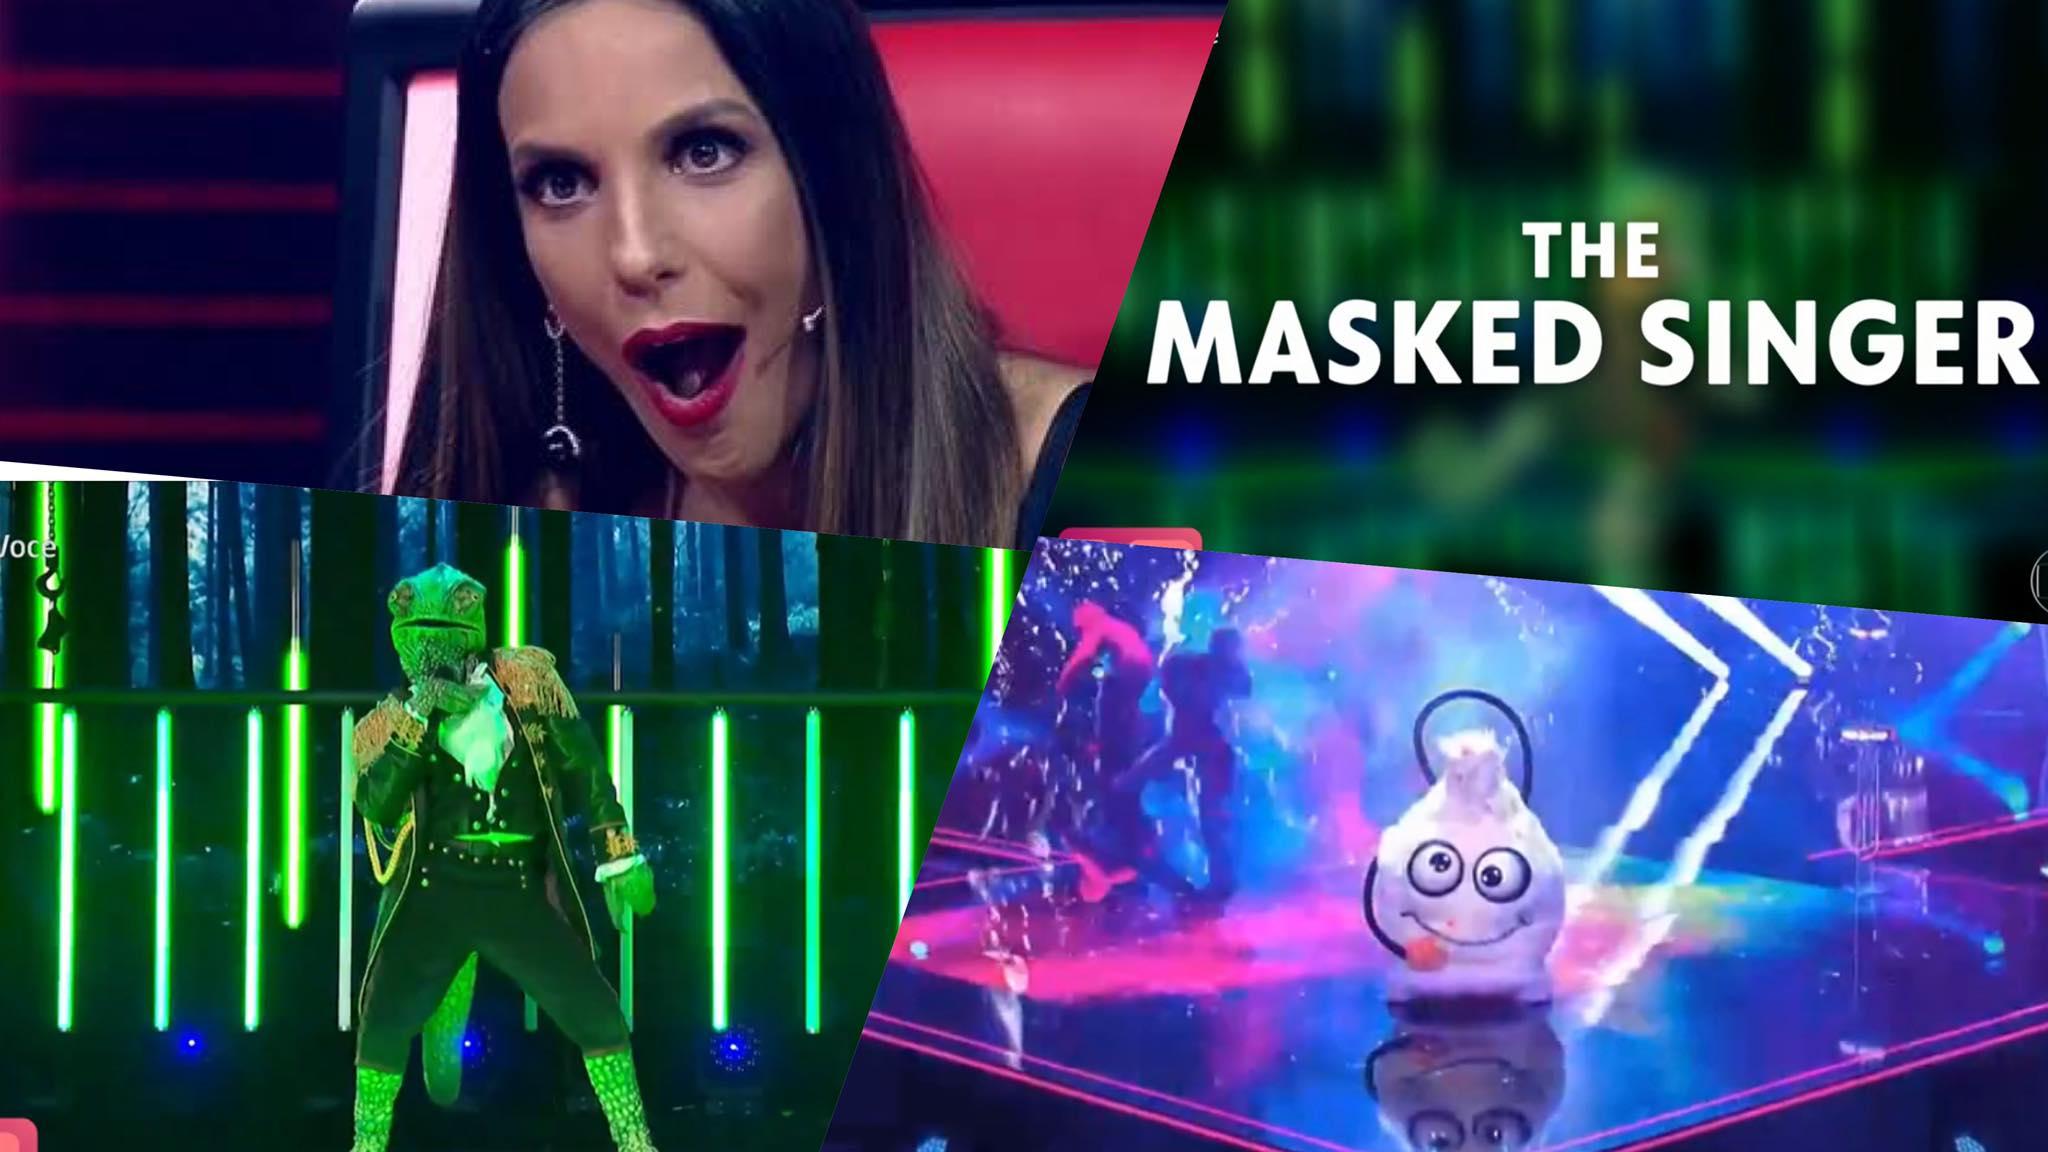 The Masked Singer Brasil estreia na Globo em agosto (montagem: Fashion Bubbles)